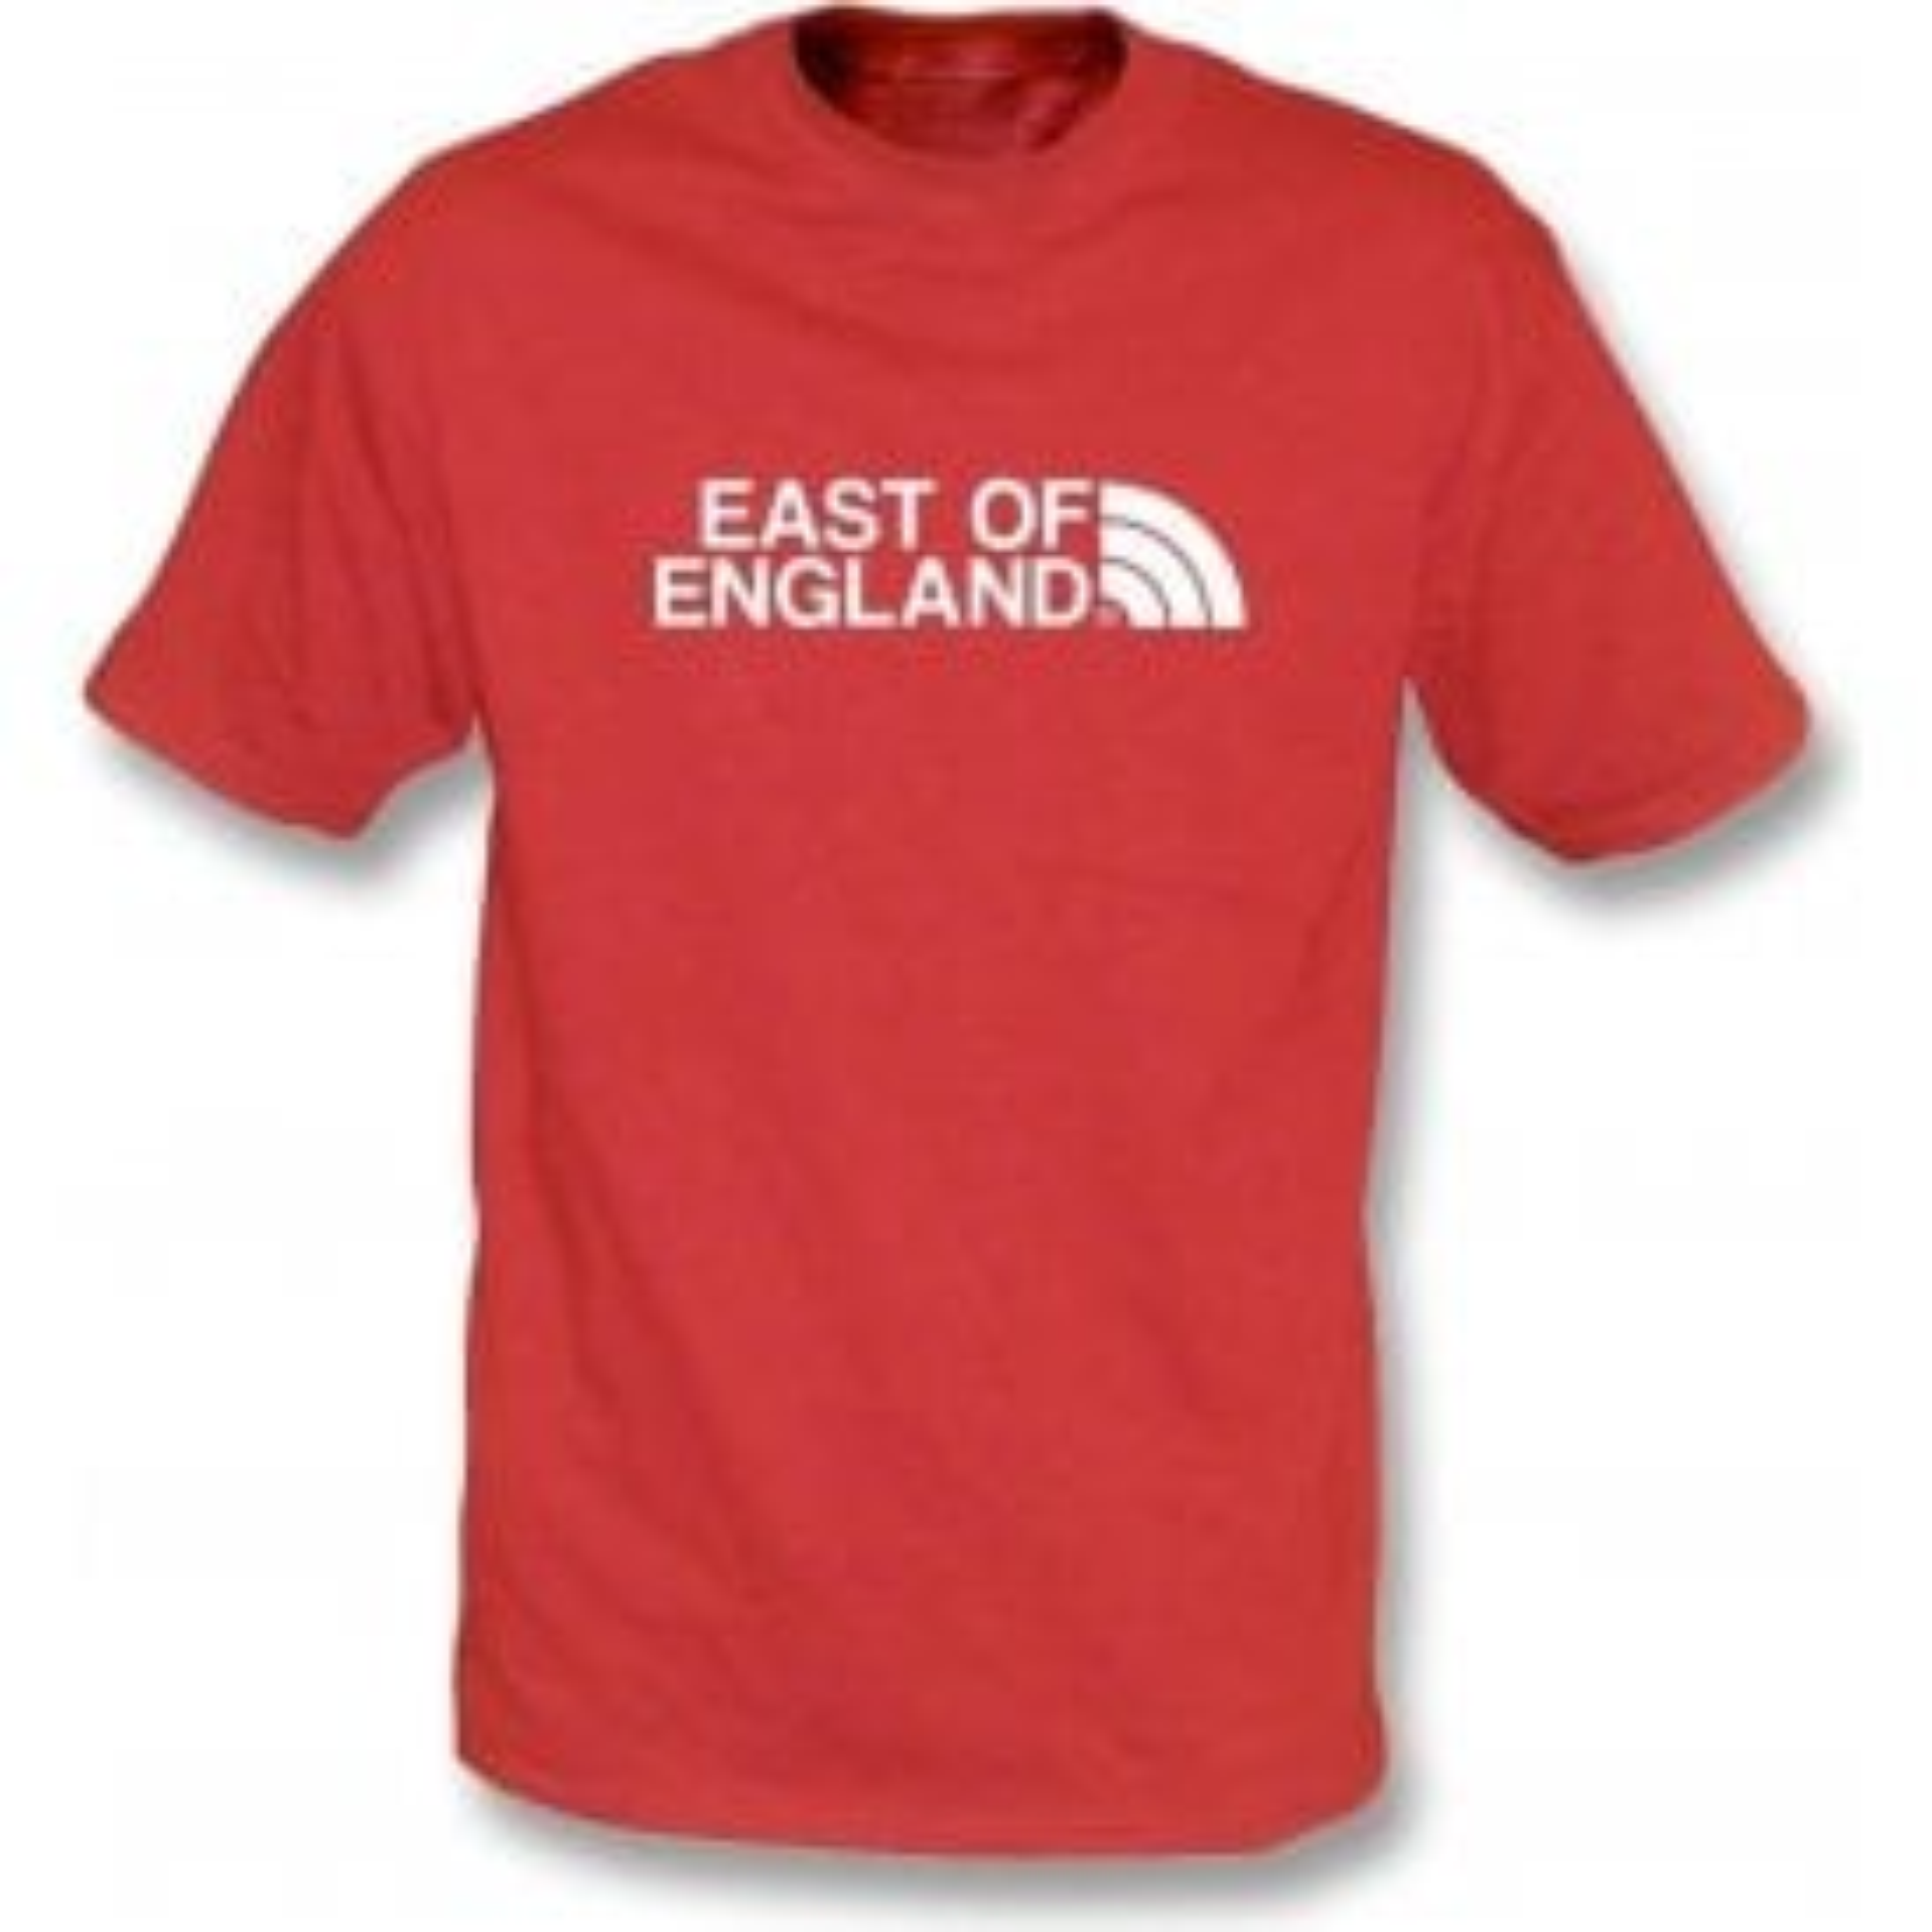 East of England (Stevenage) T-Shirt